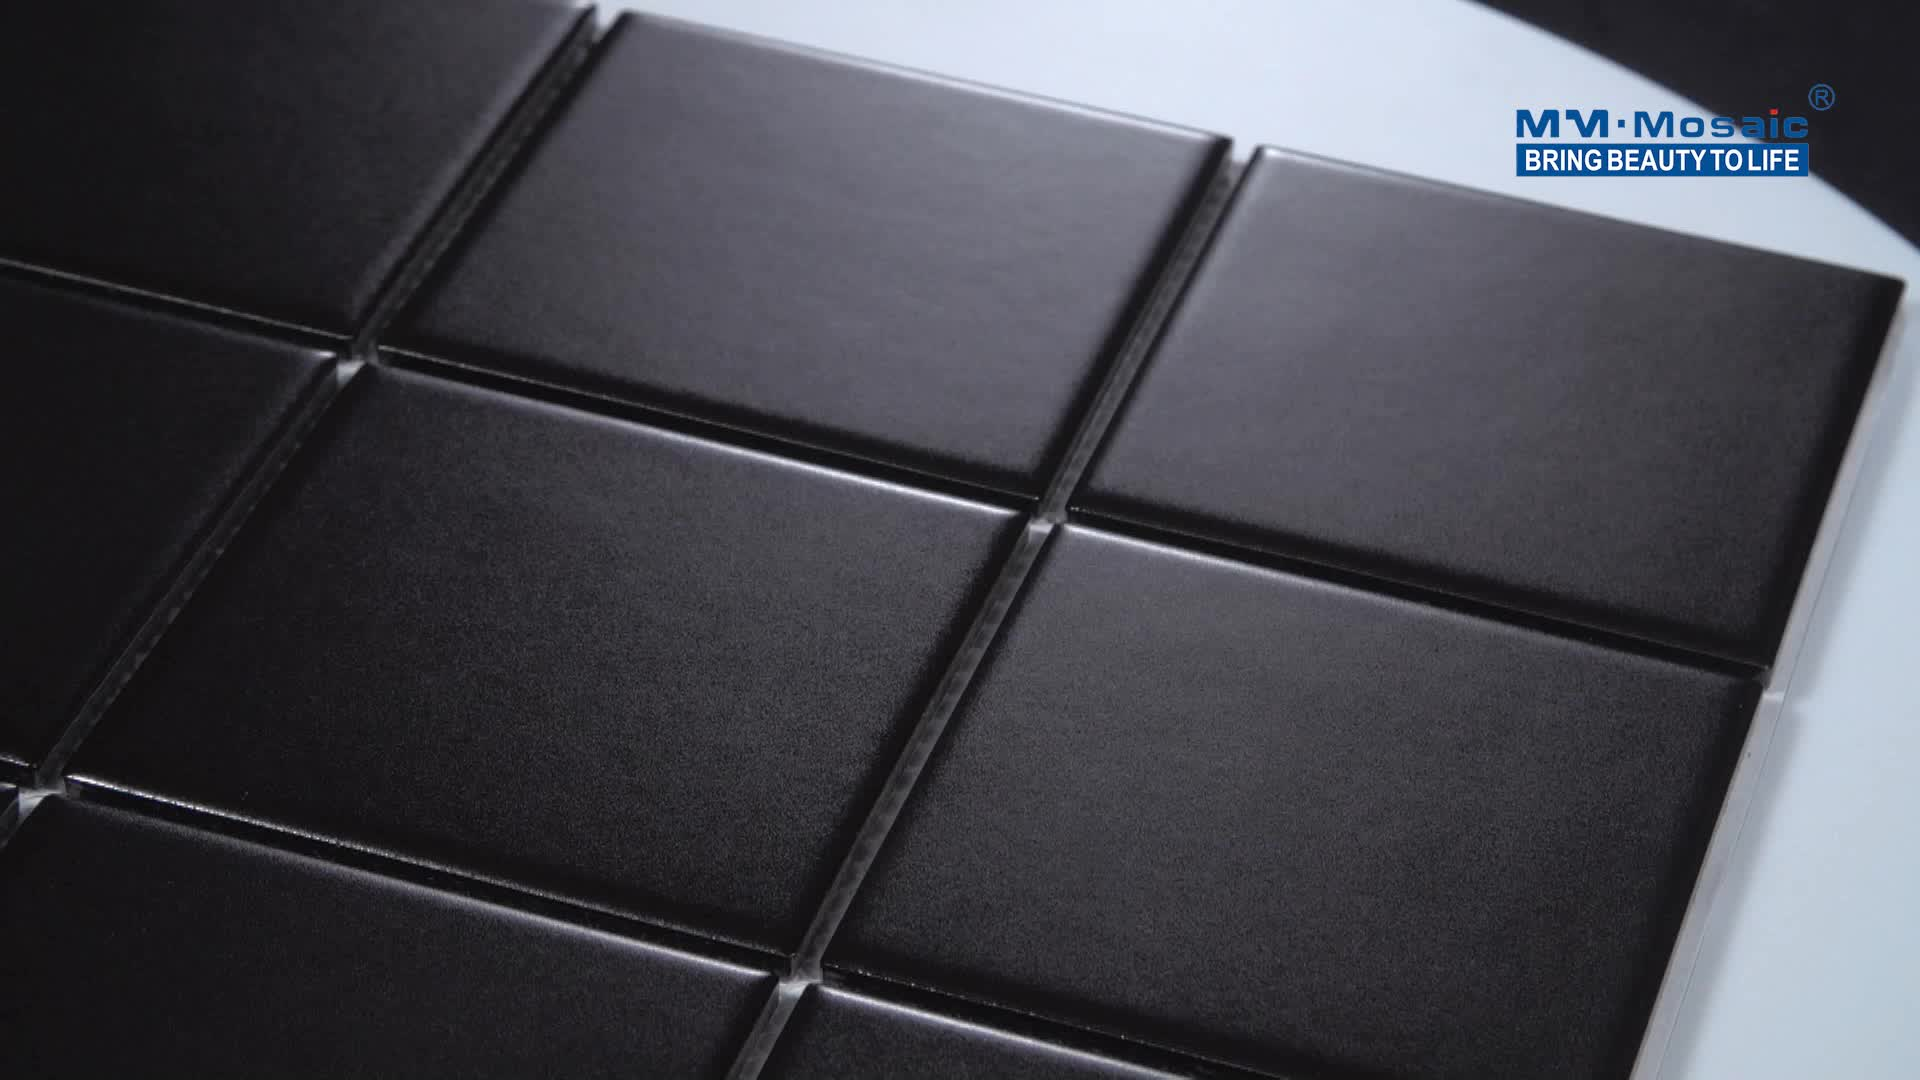 Stile semplice nero opaco quadrato backsplash piastrelle